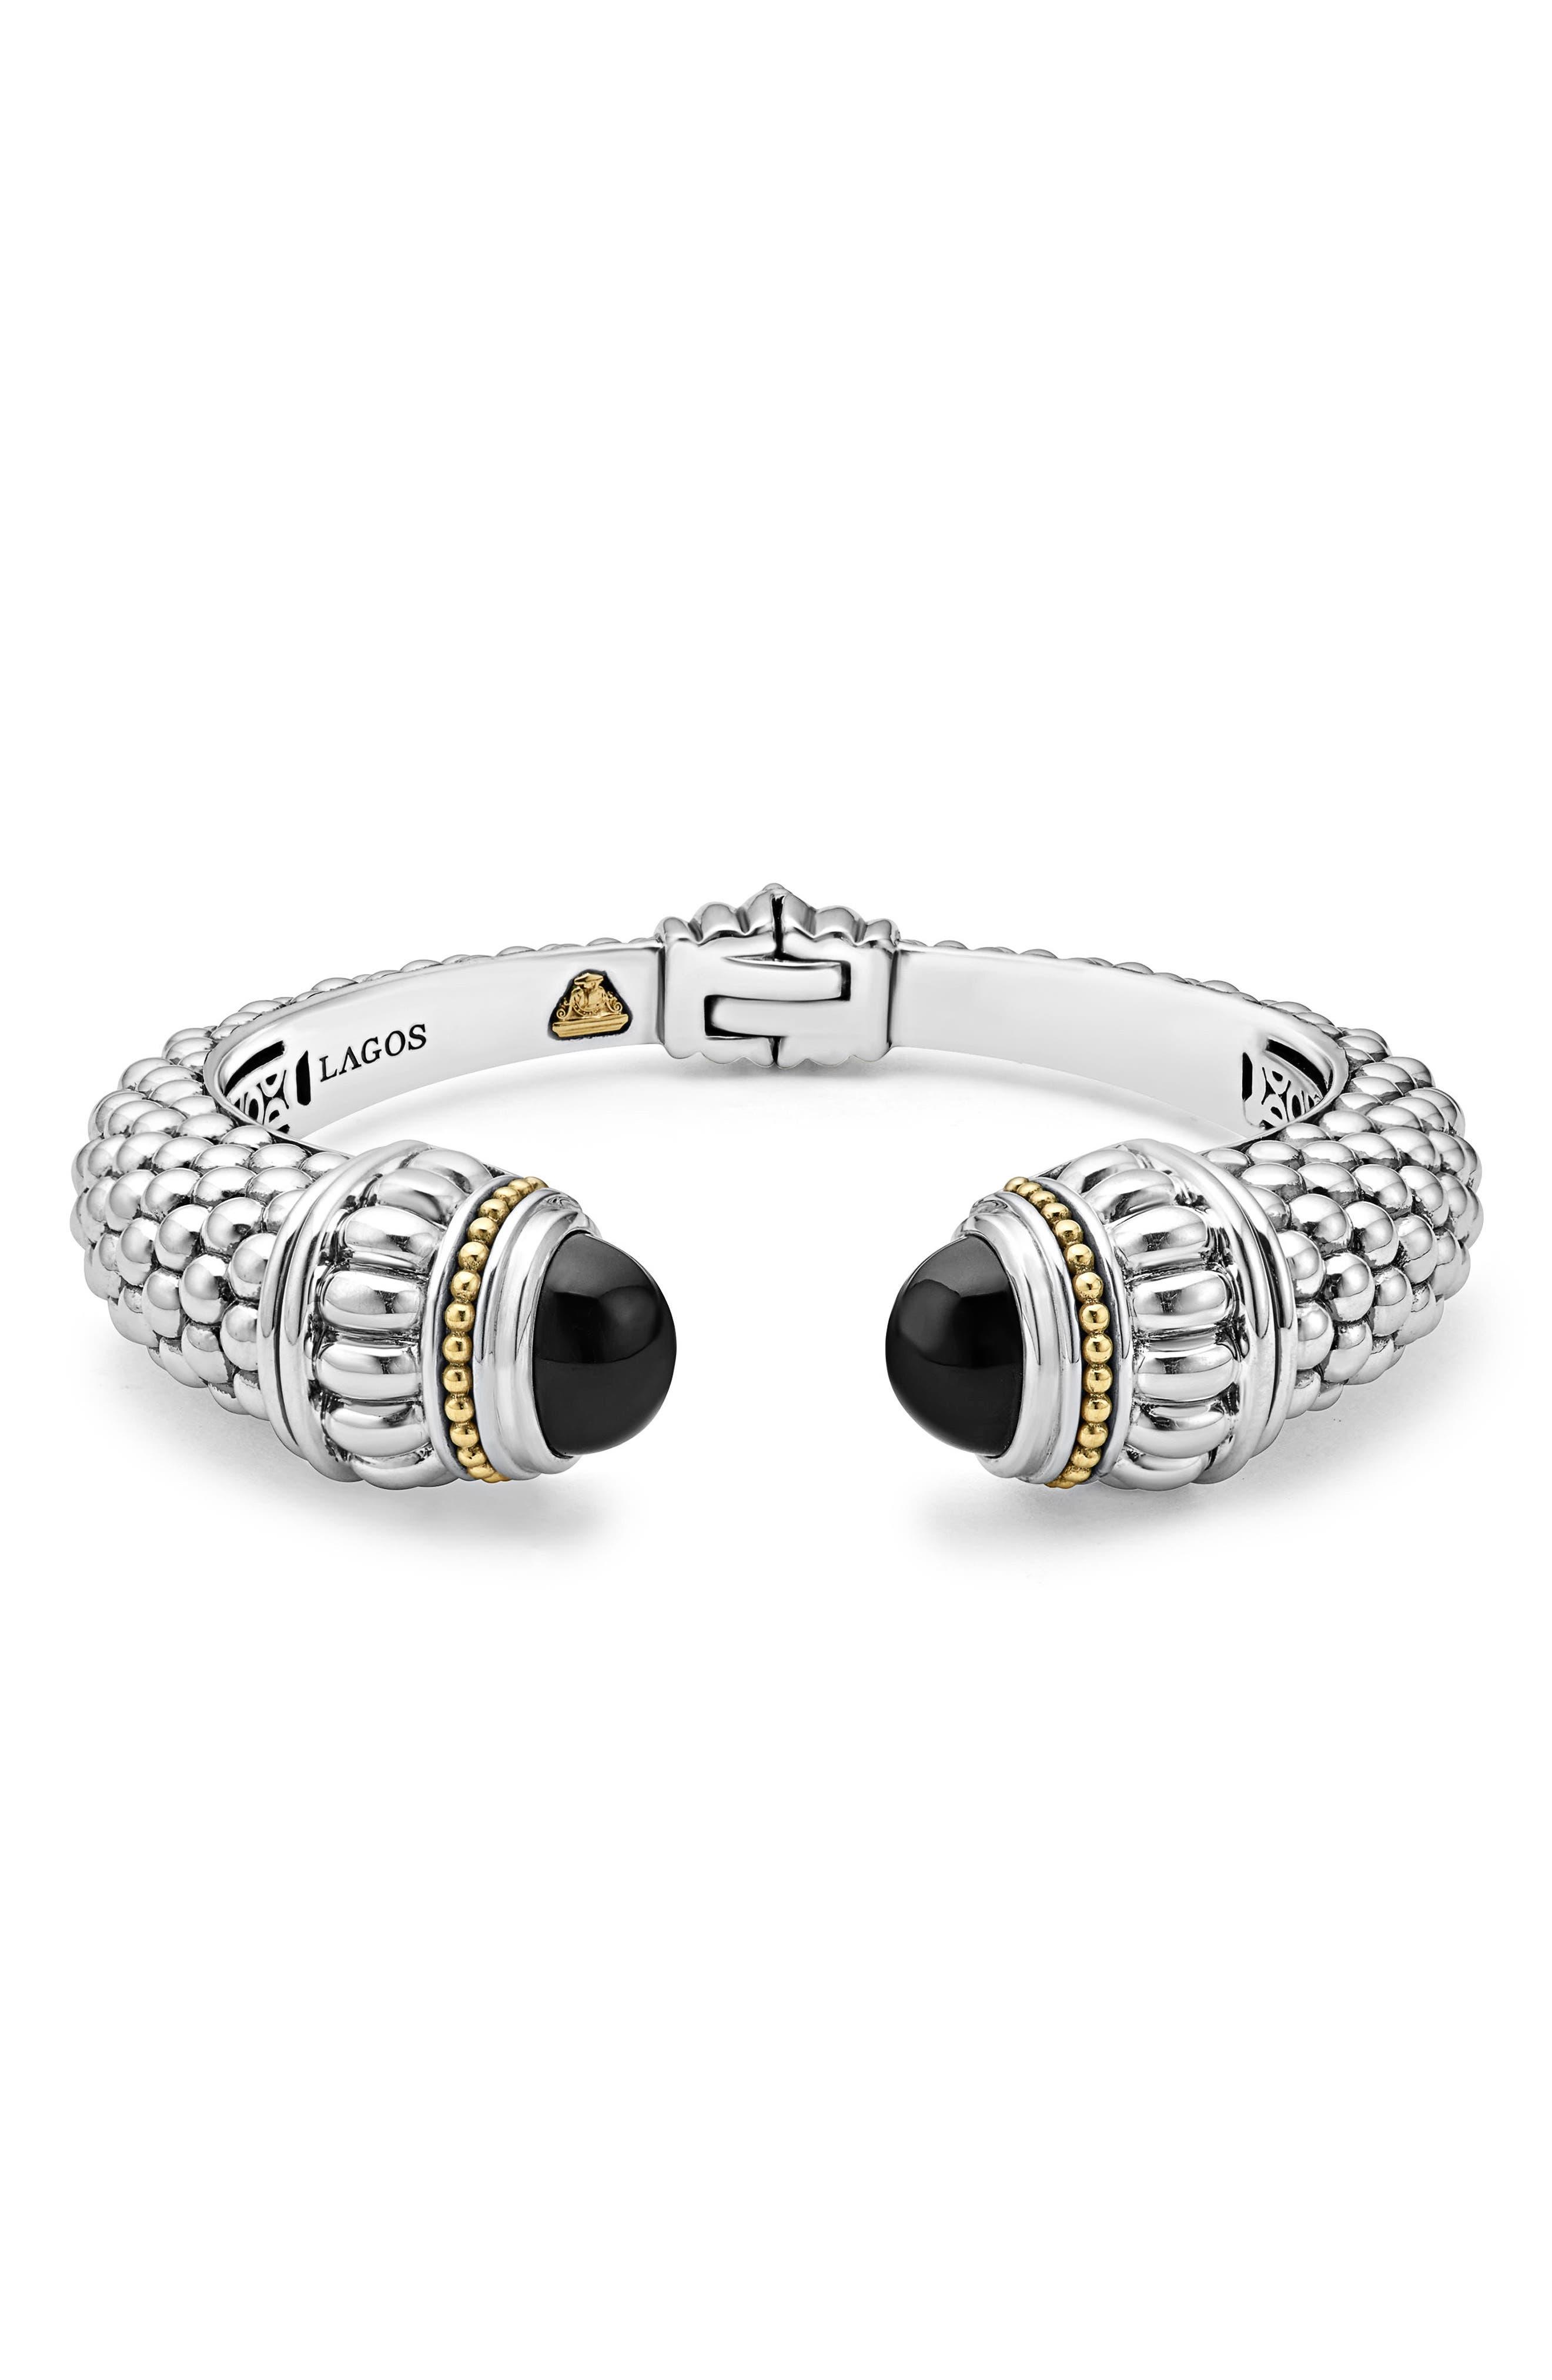 Caviar Color Hinge Wrist Cuff,                         Main,                         color, Black Onyx